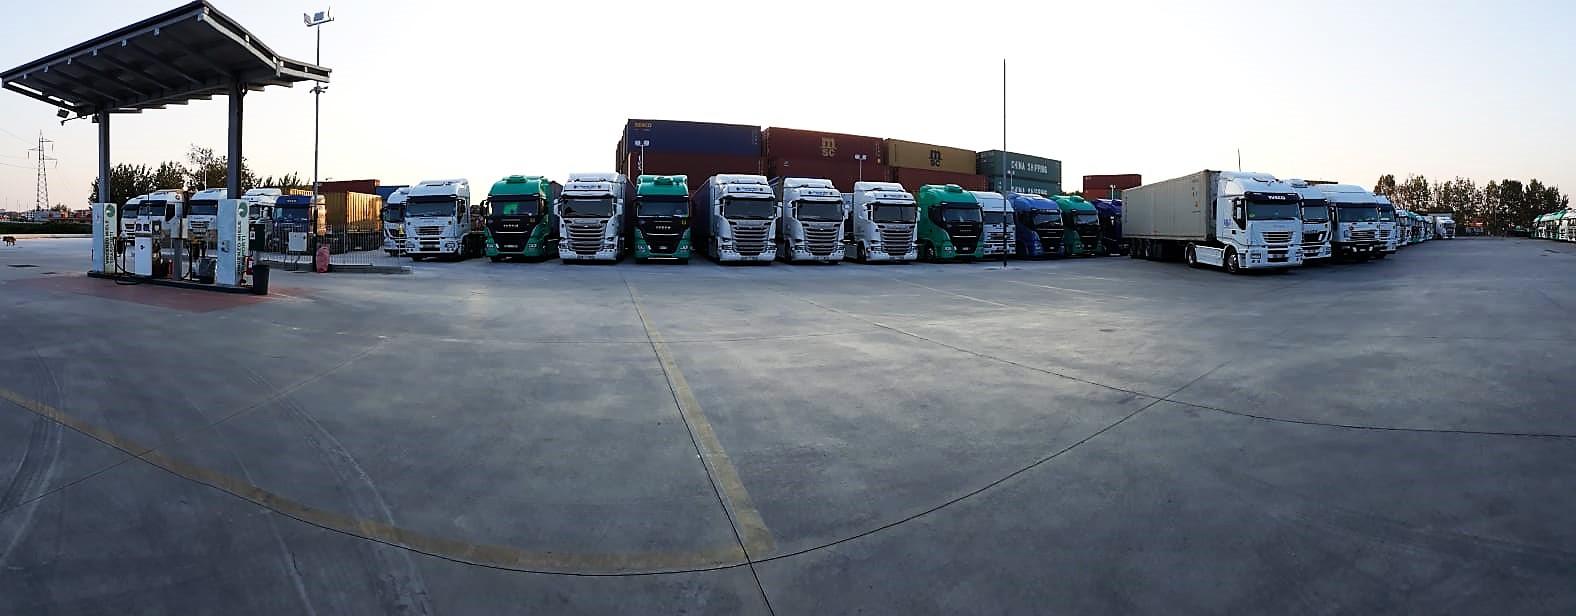 flotta vincenzo miele trasporti campania